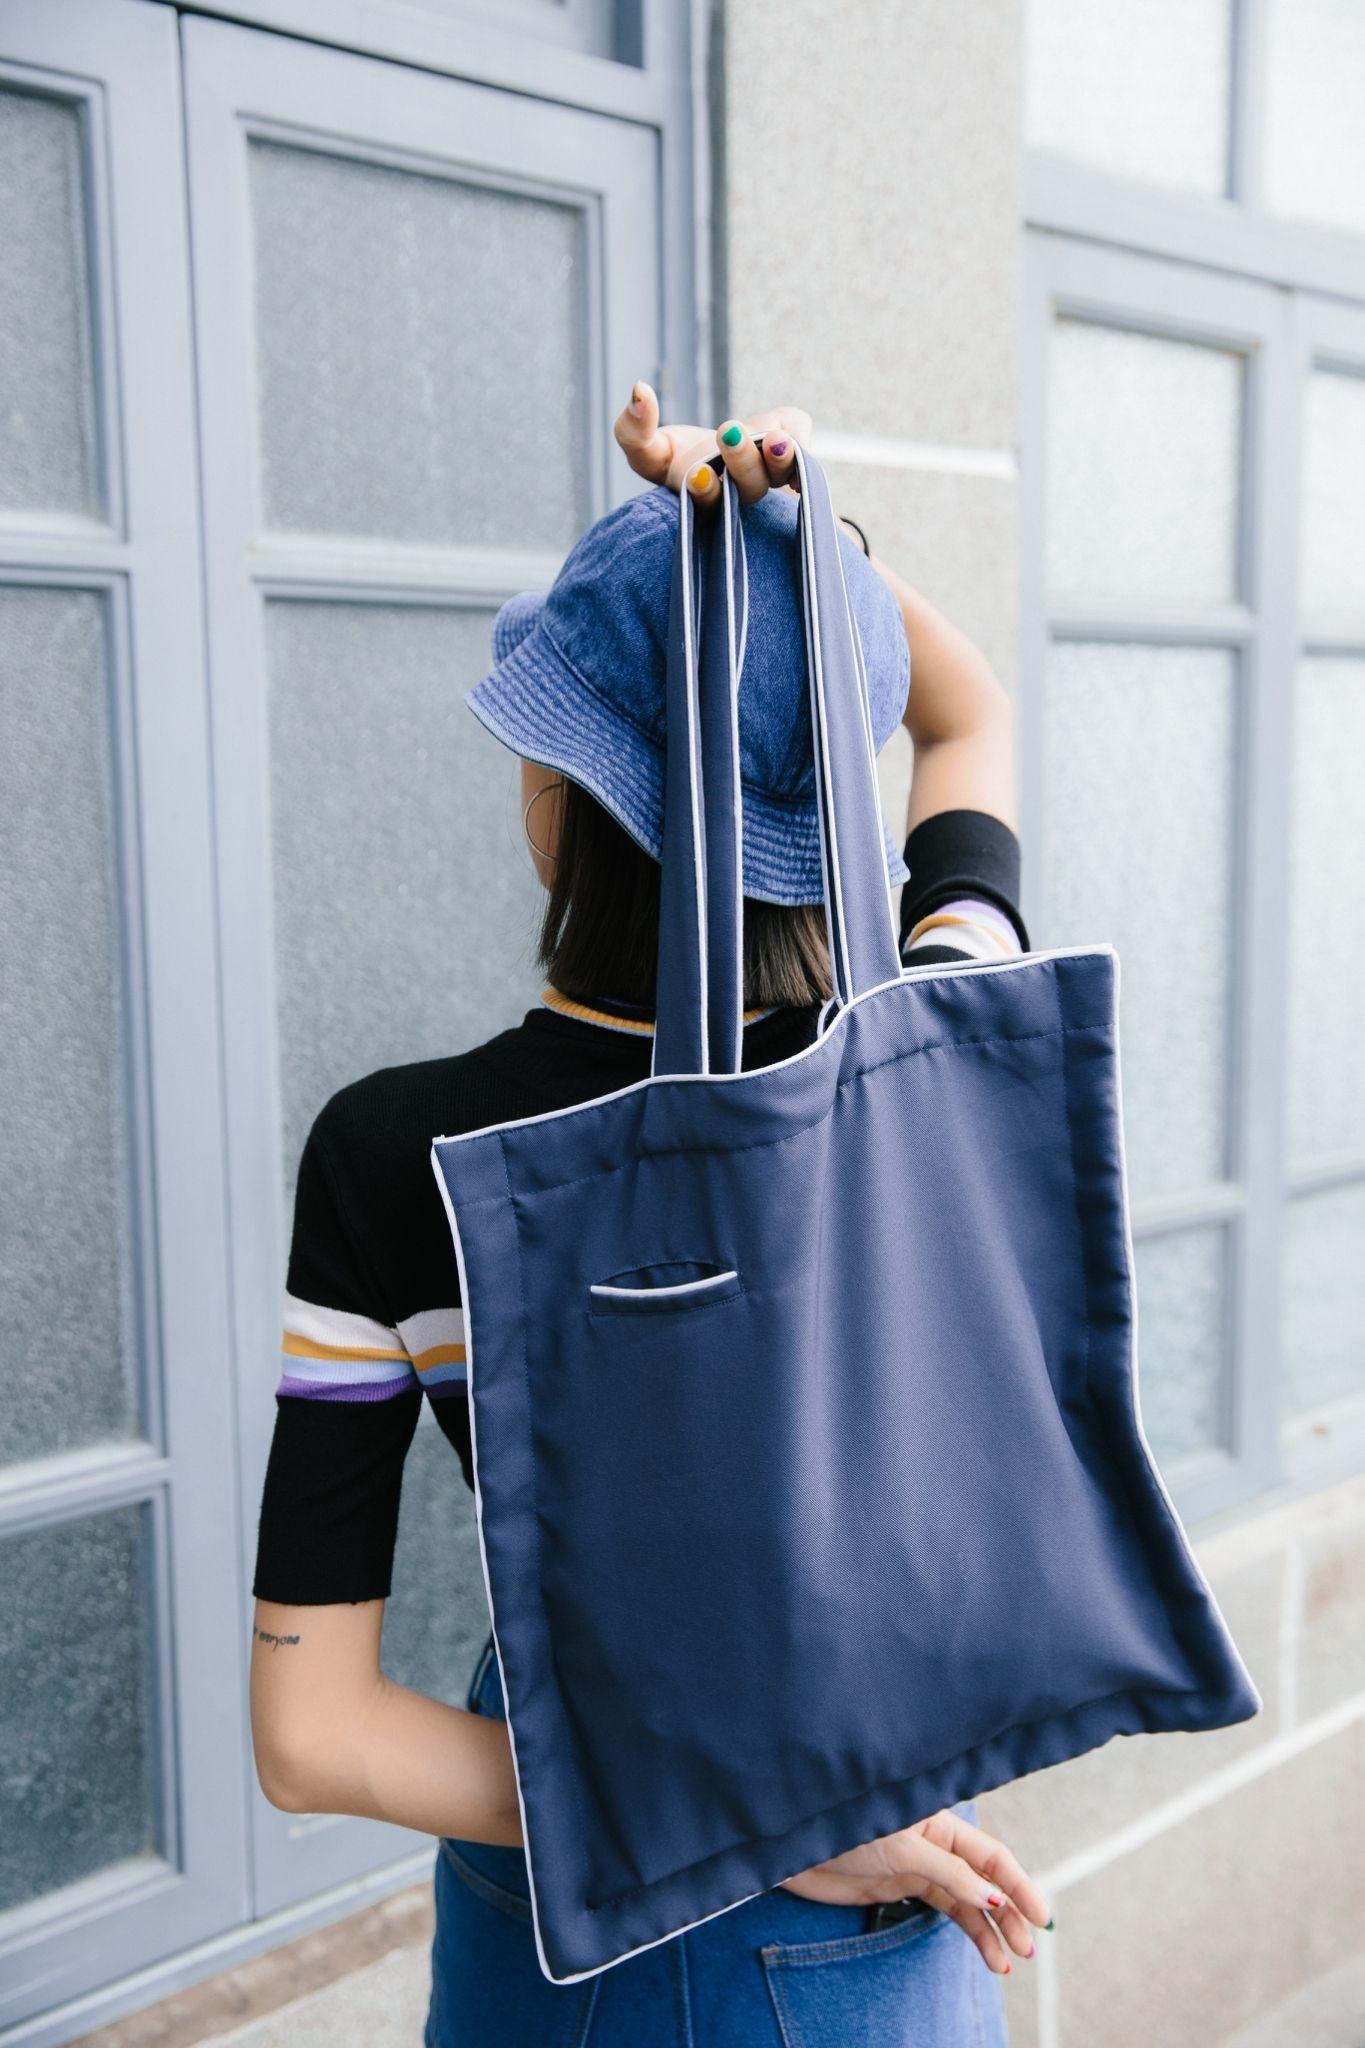 26d8f67501c8 Vavavala Tote – Navy Blue Tote Bag